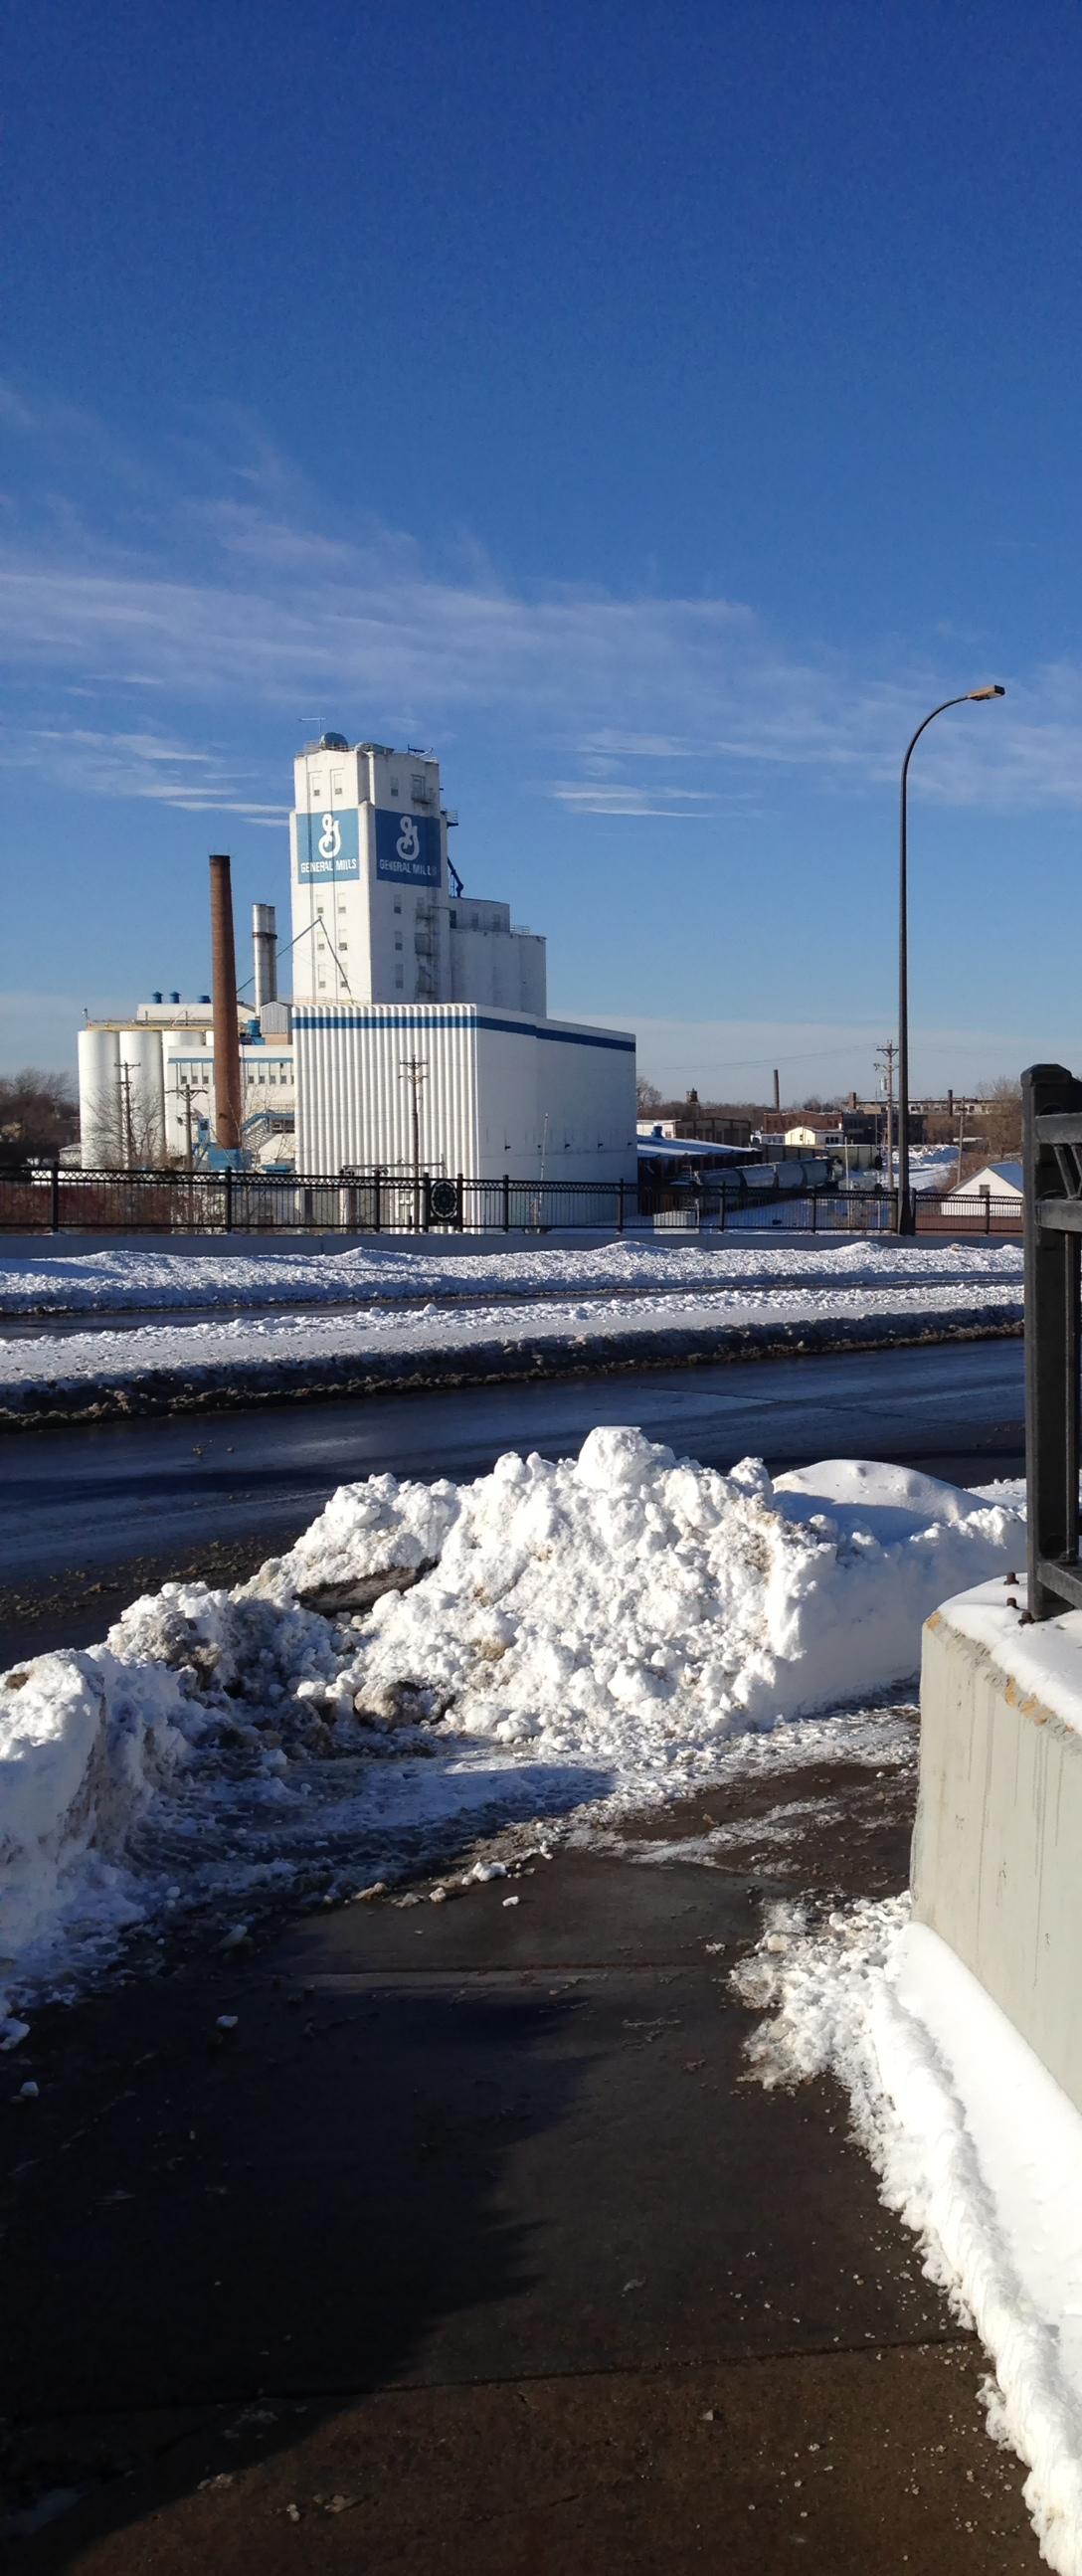 General Mills silo